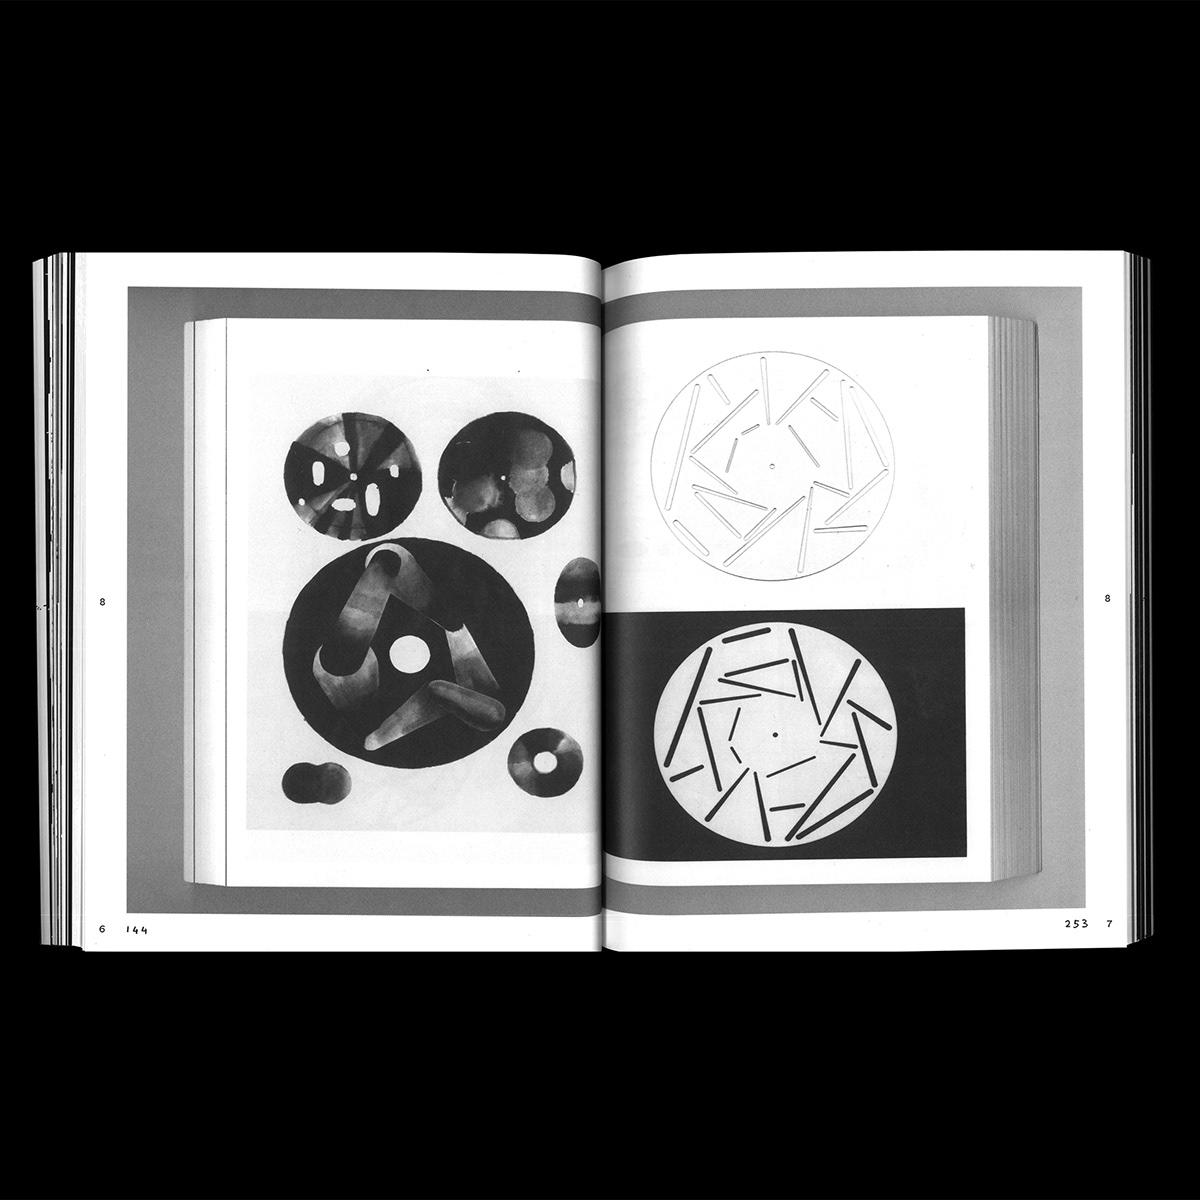 Image may contain: ball, drawing and illustration